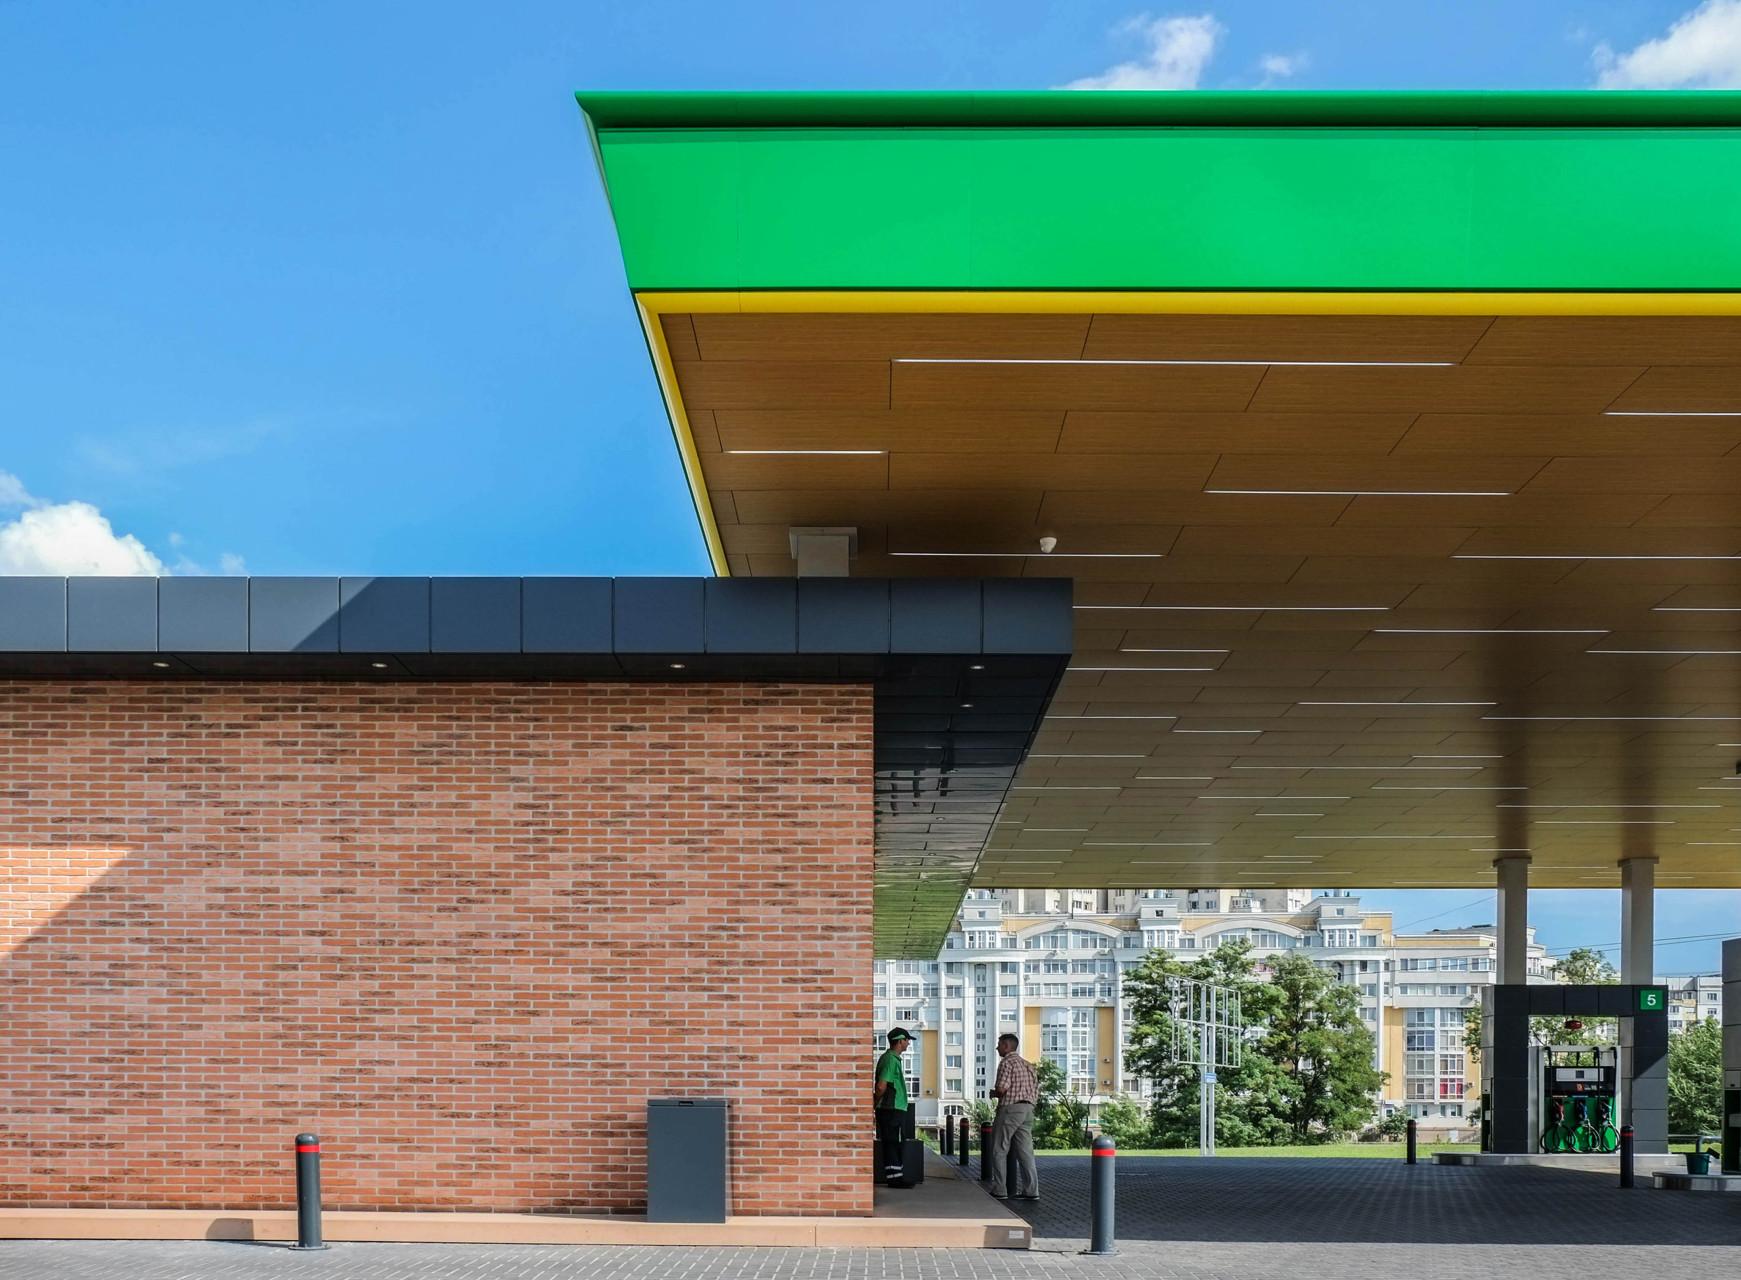 Wisp-Bemol-gas-station-Side-facade